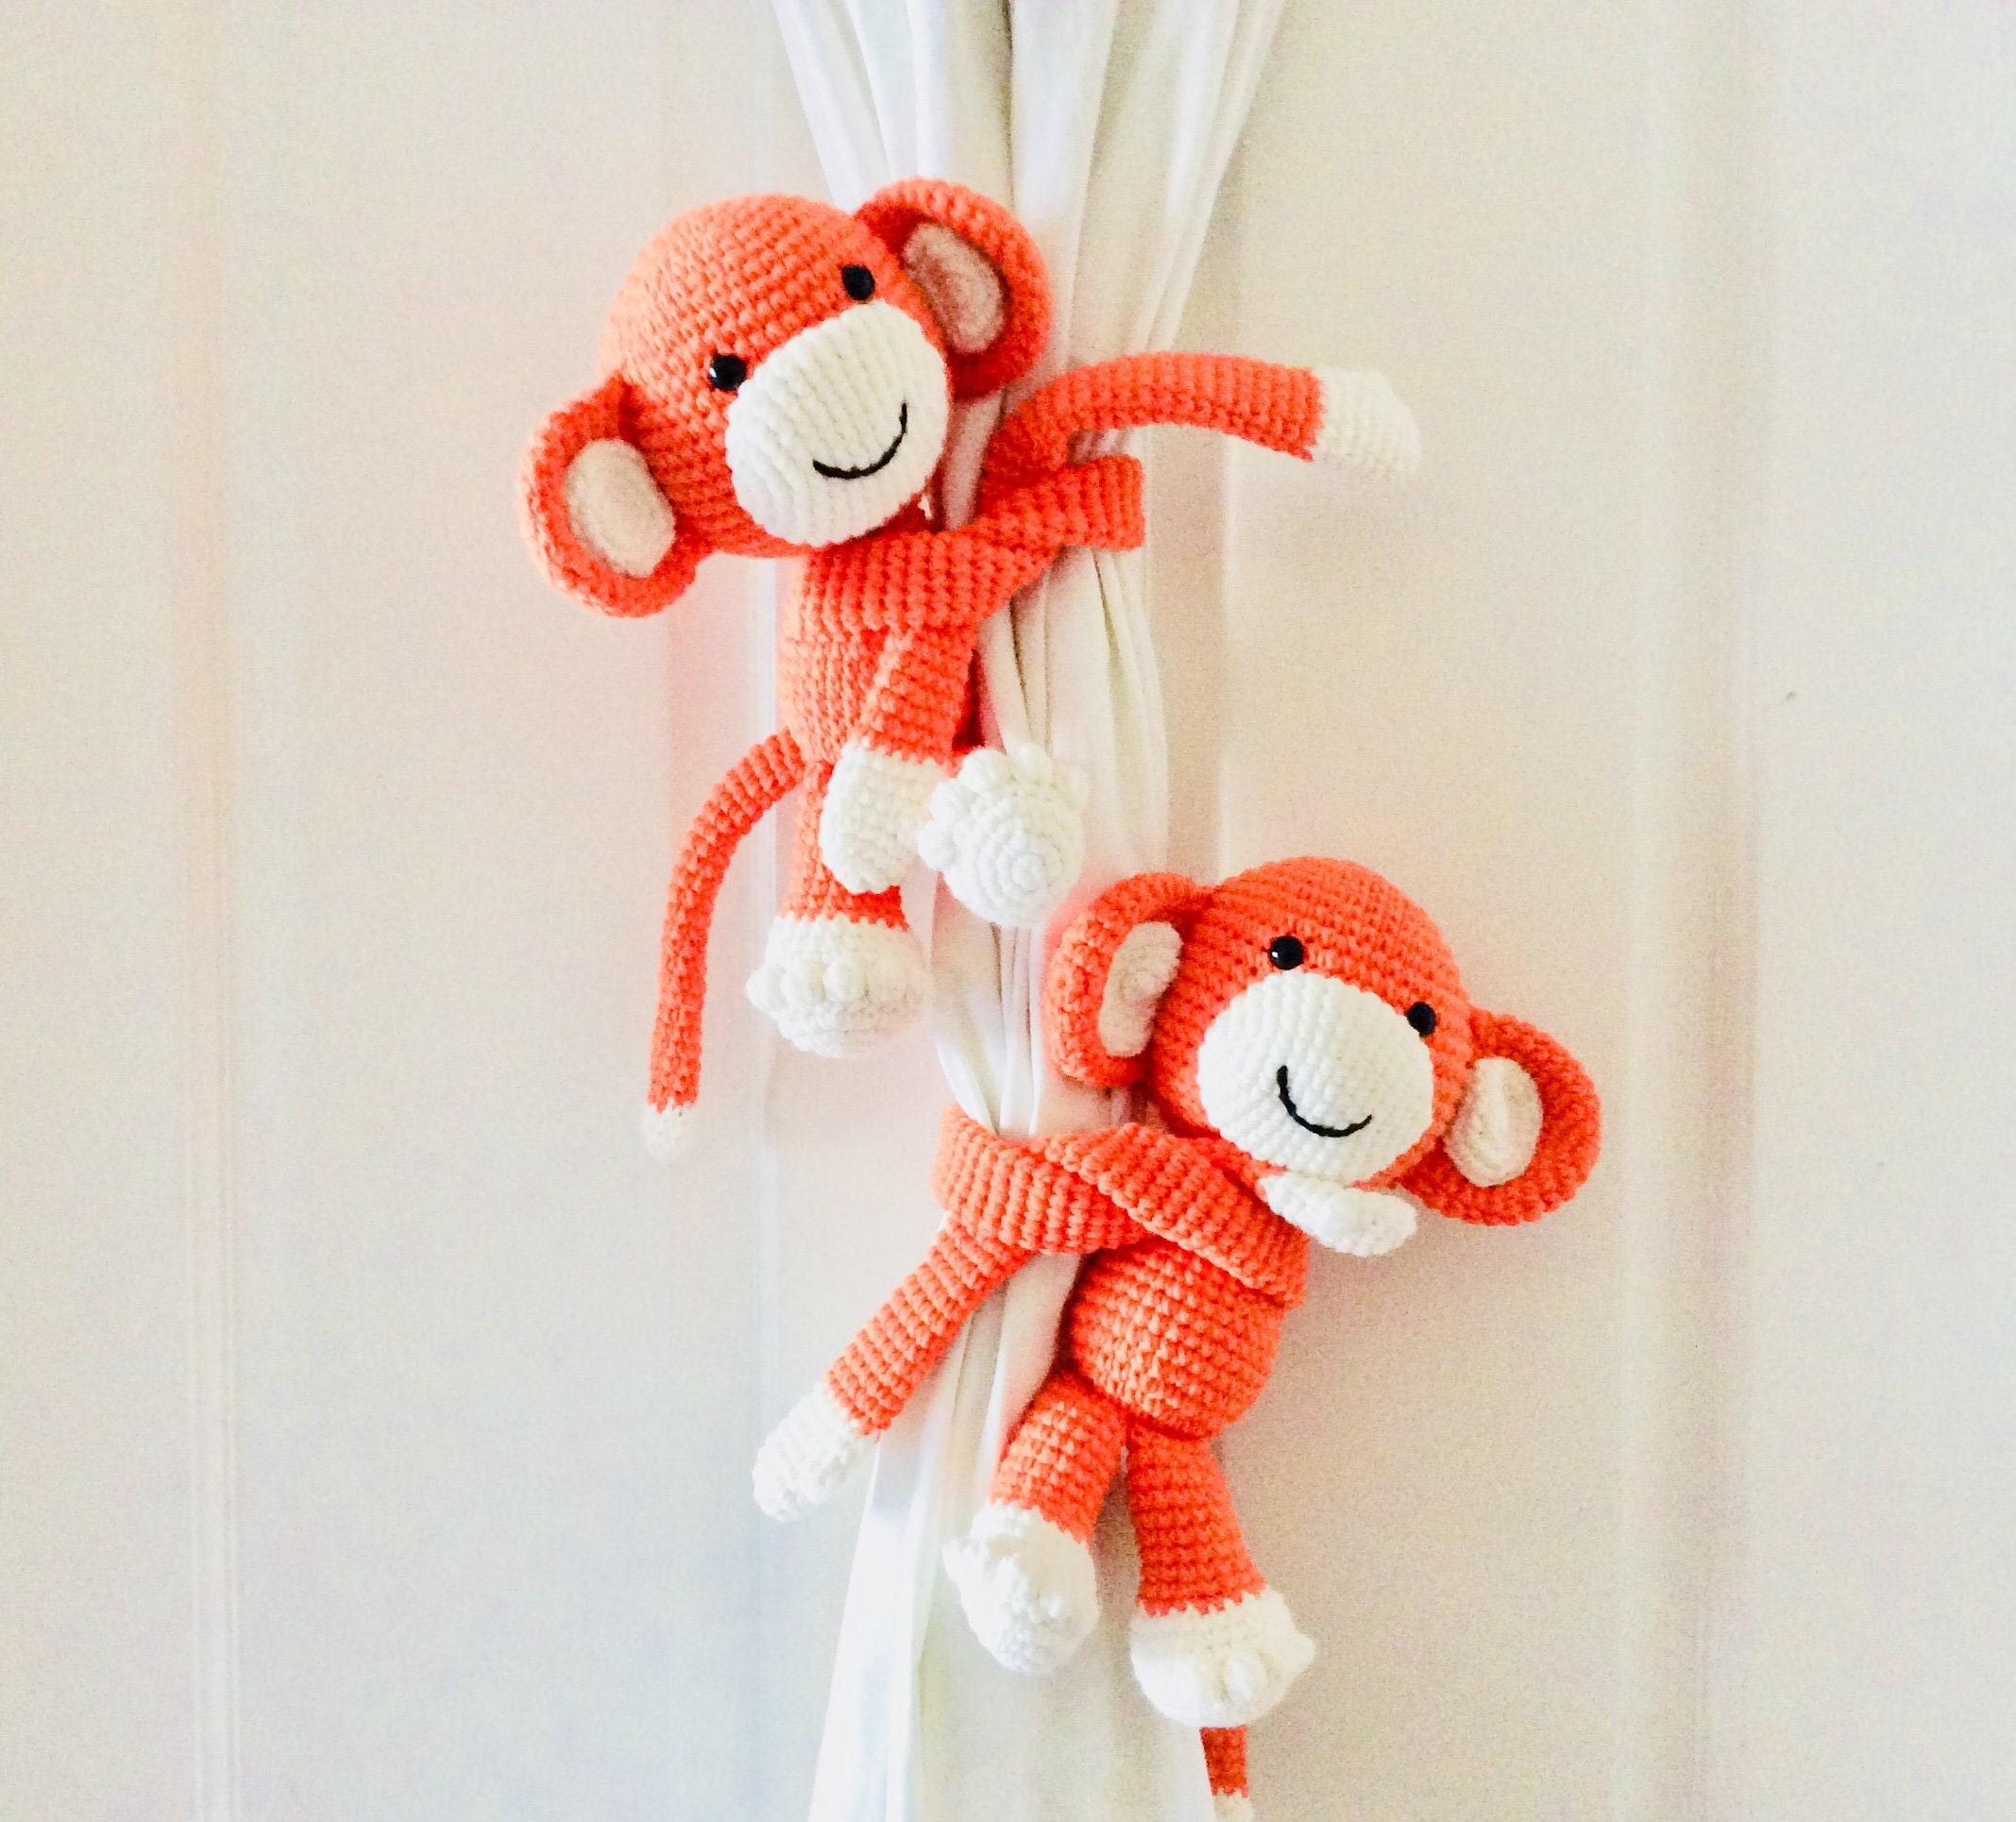 Amigurumi Knitting (Amigurumi) Knitting Toys Curtain Holder 1 ... | 1930x2135